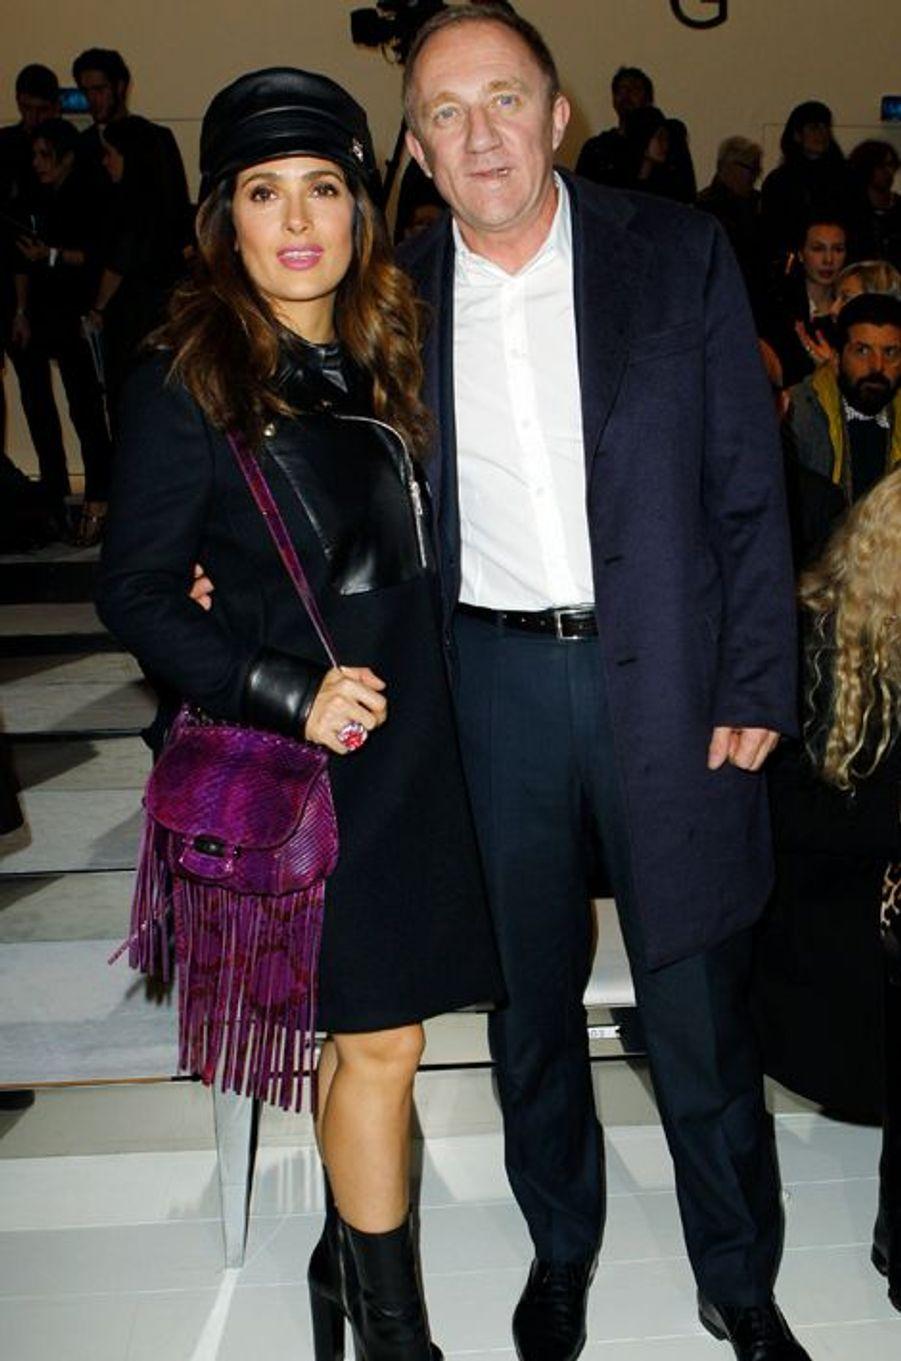 Salma Hayek et son mari François-Henri Pinault, à la tête de Kering, qui possède Gucci